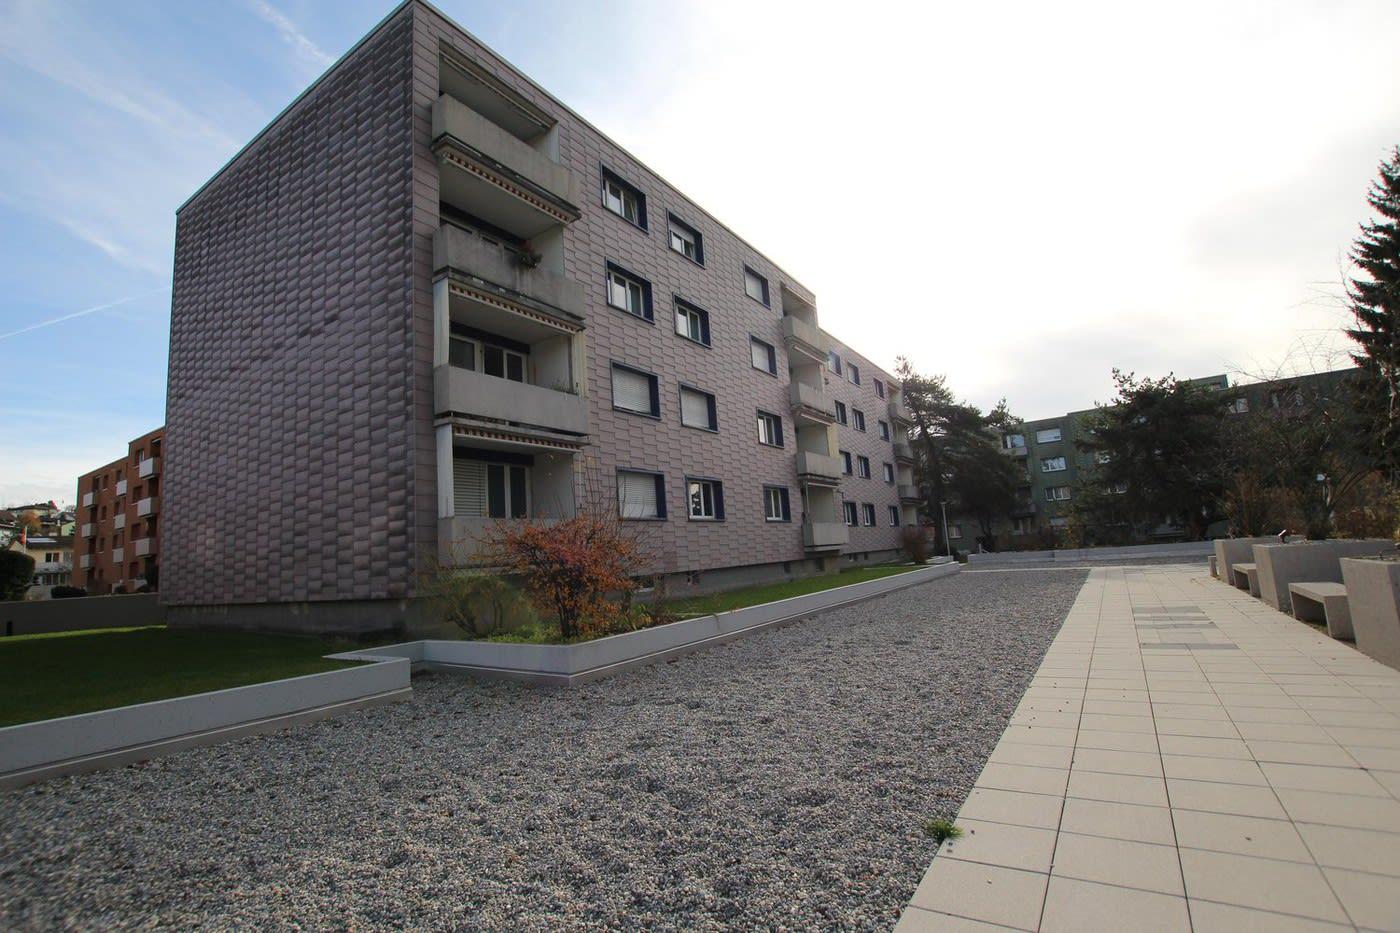 Witenwisstrasse 23b